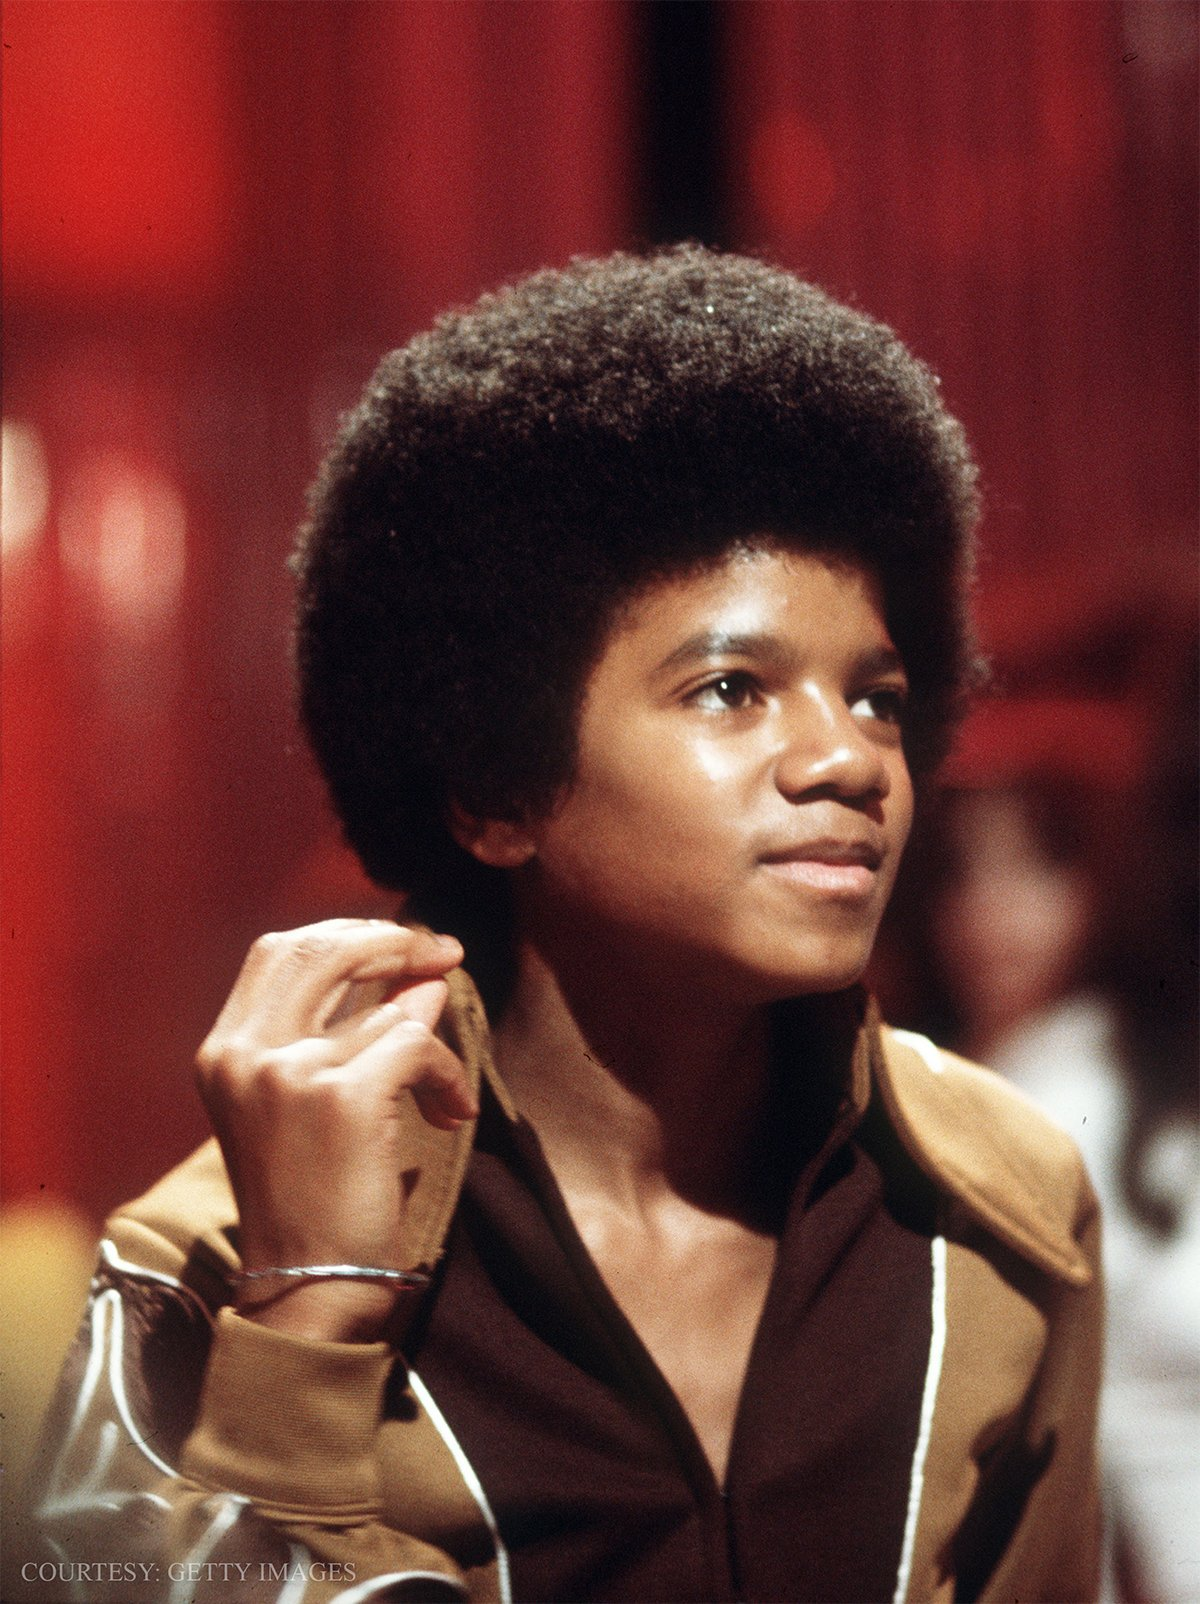 Michael Jackson On His Early Performances